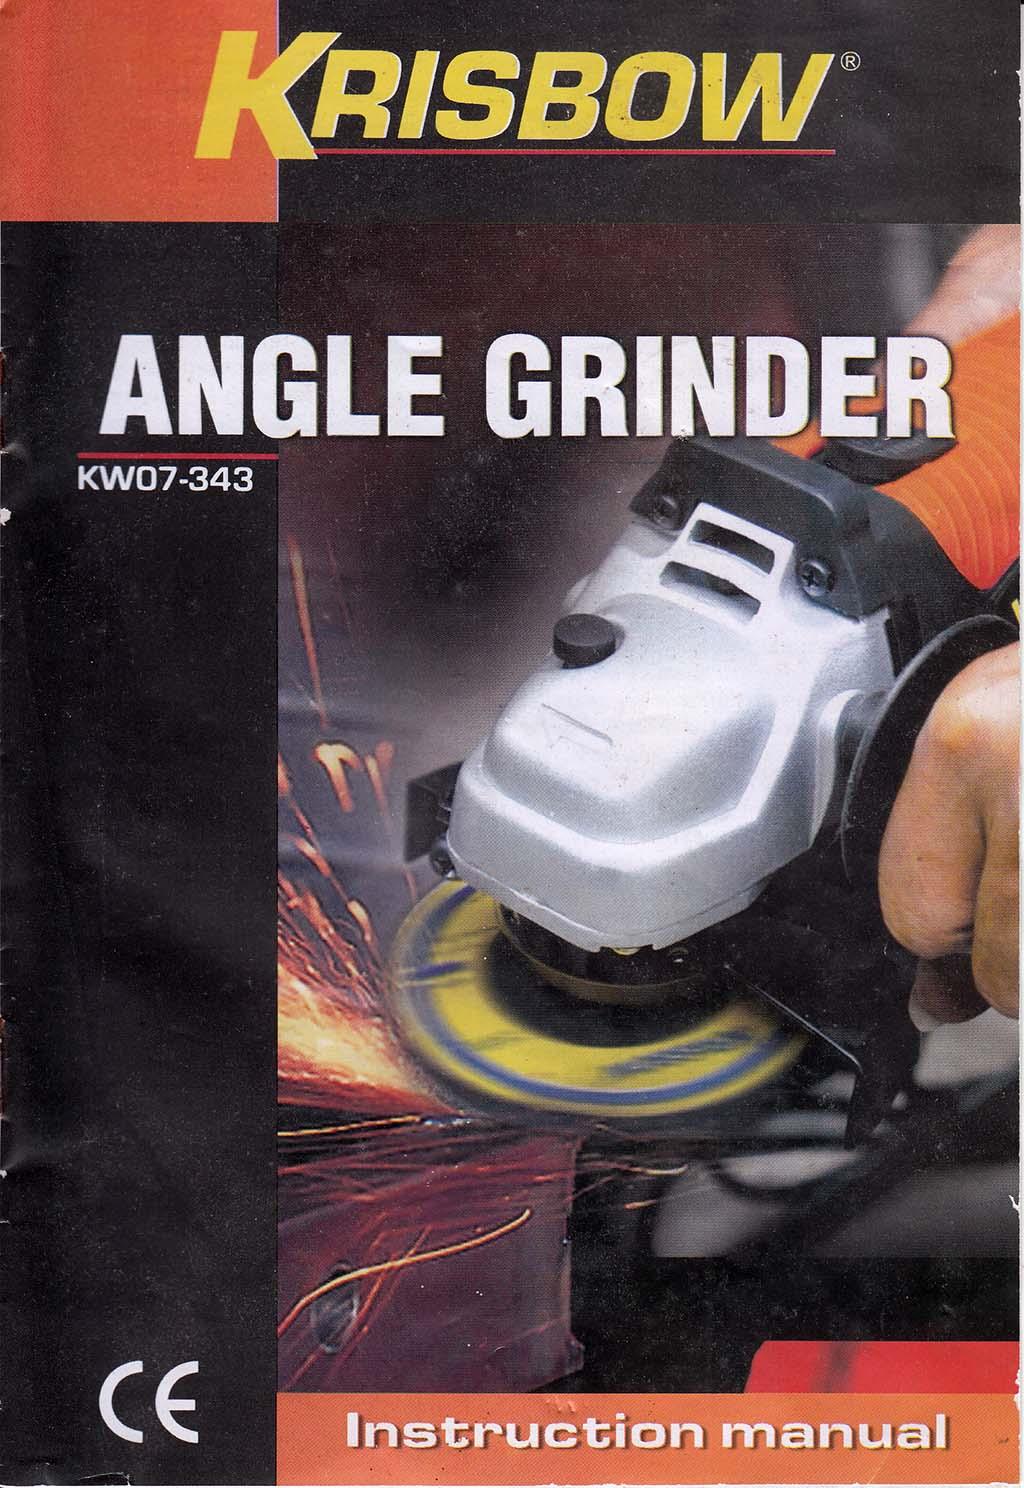 Krisbow Angle Grinder KW07-343